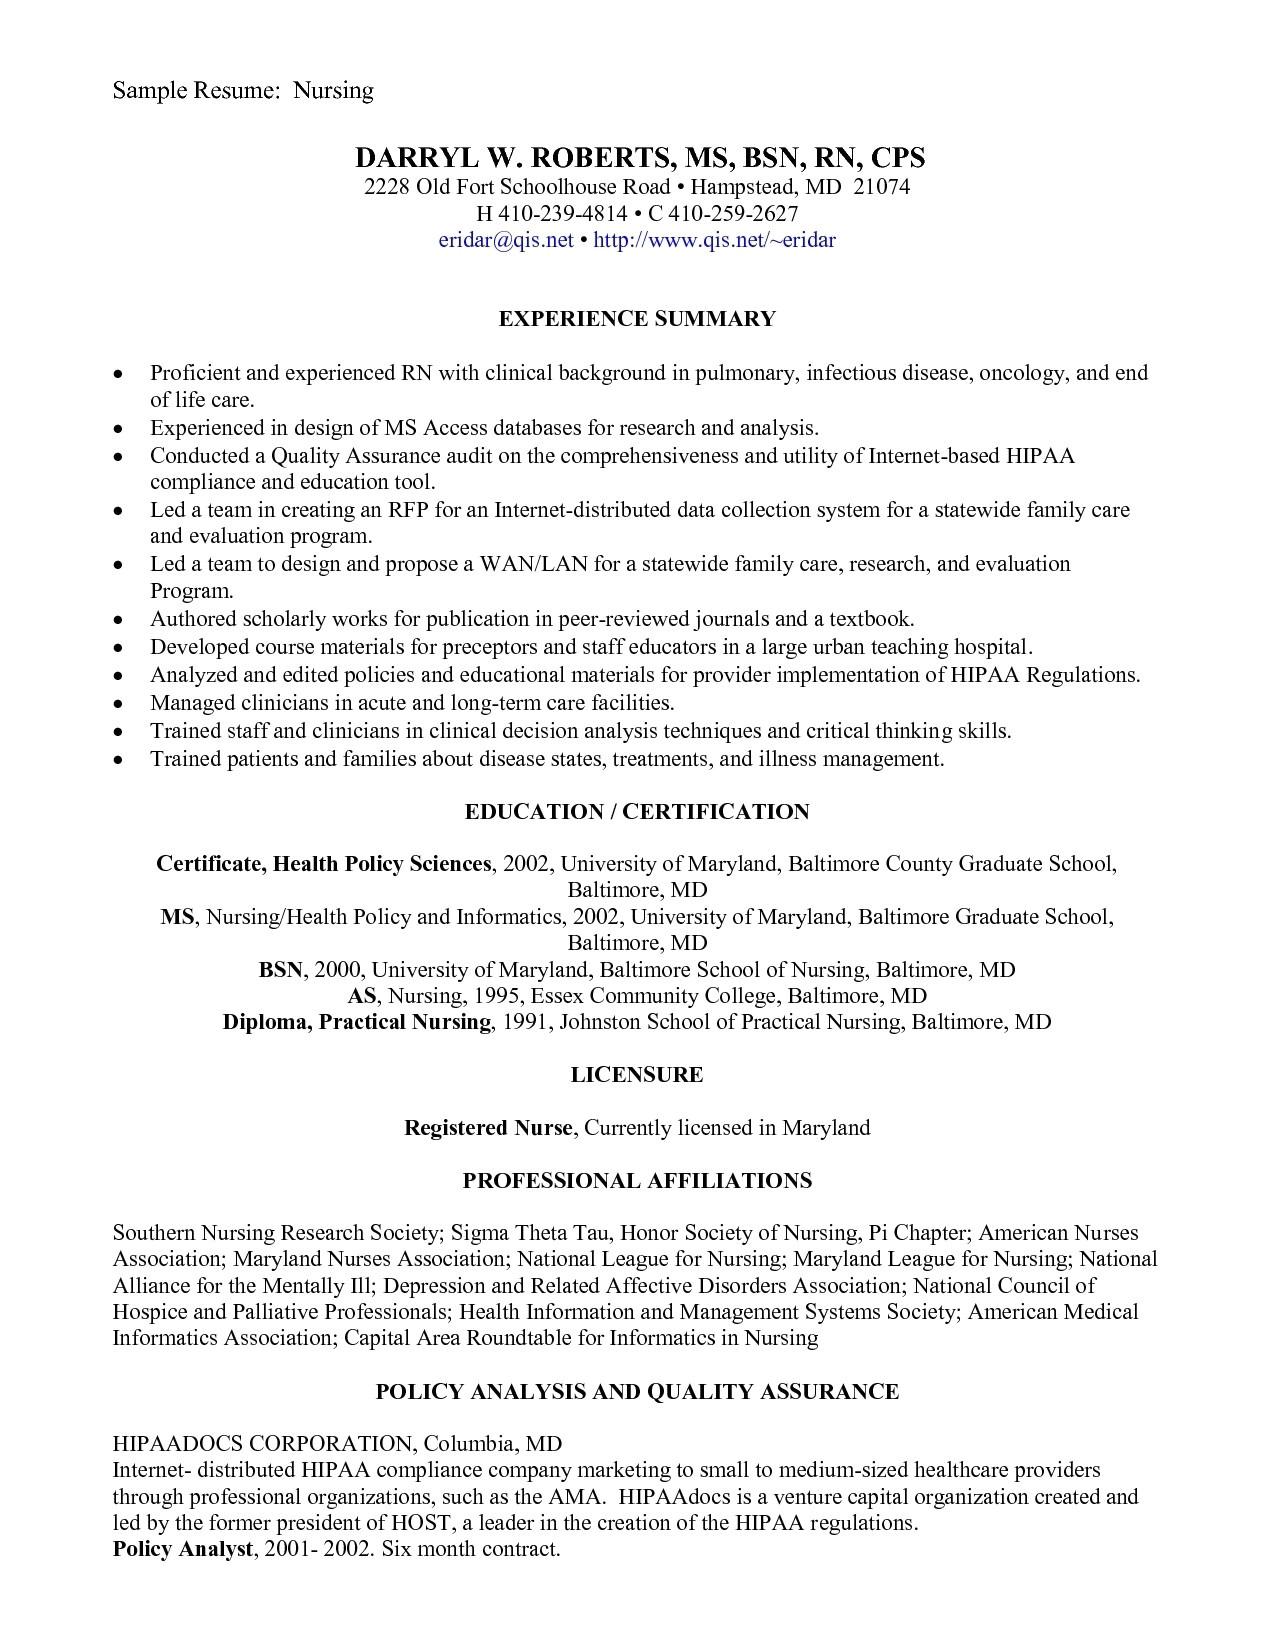 Sample Resume for Nurses Newly Graduated Newly Graduate Resume Sample New Grad Nurse Practitioner